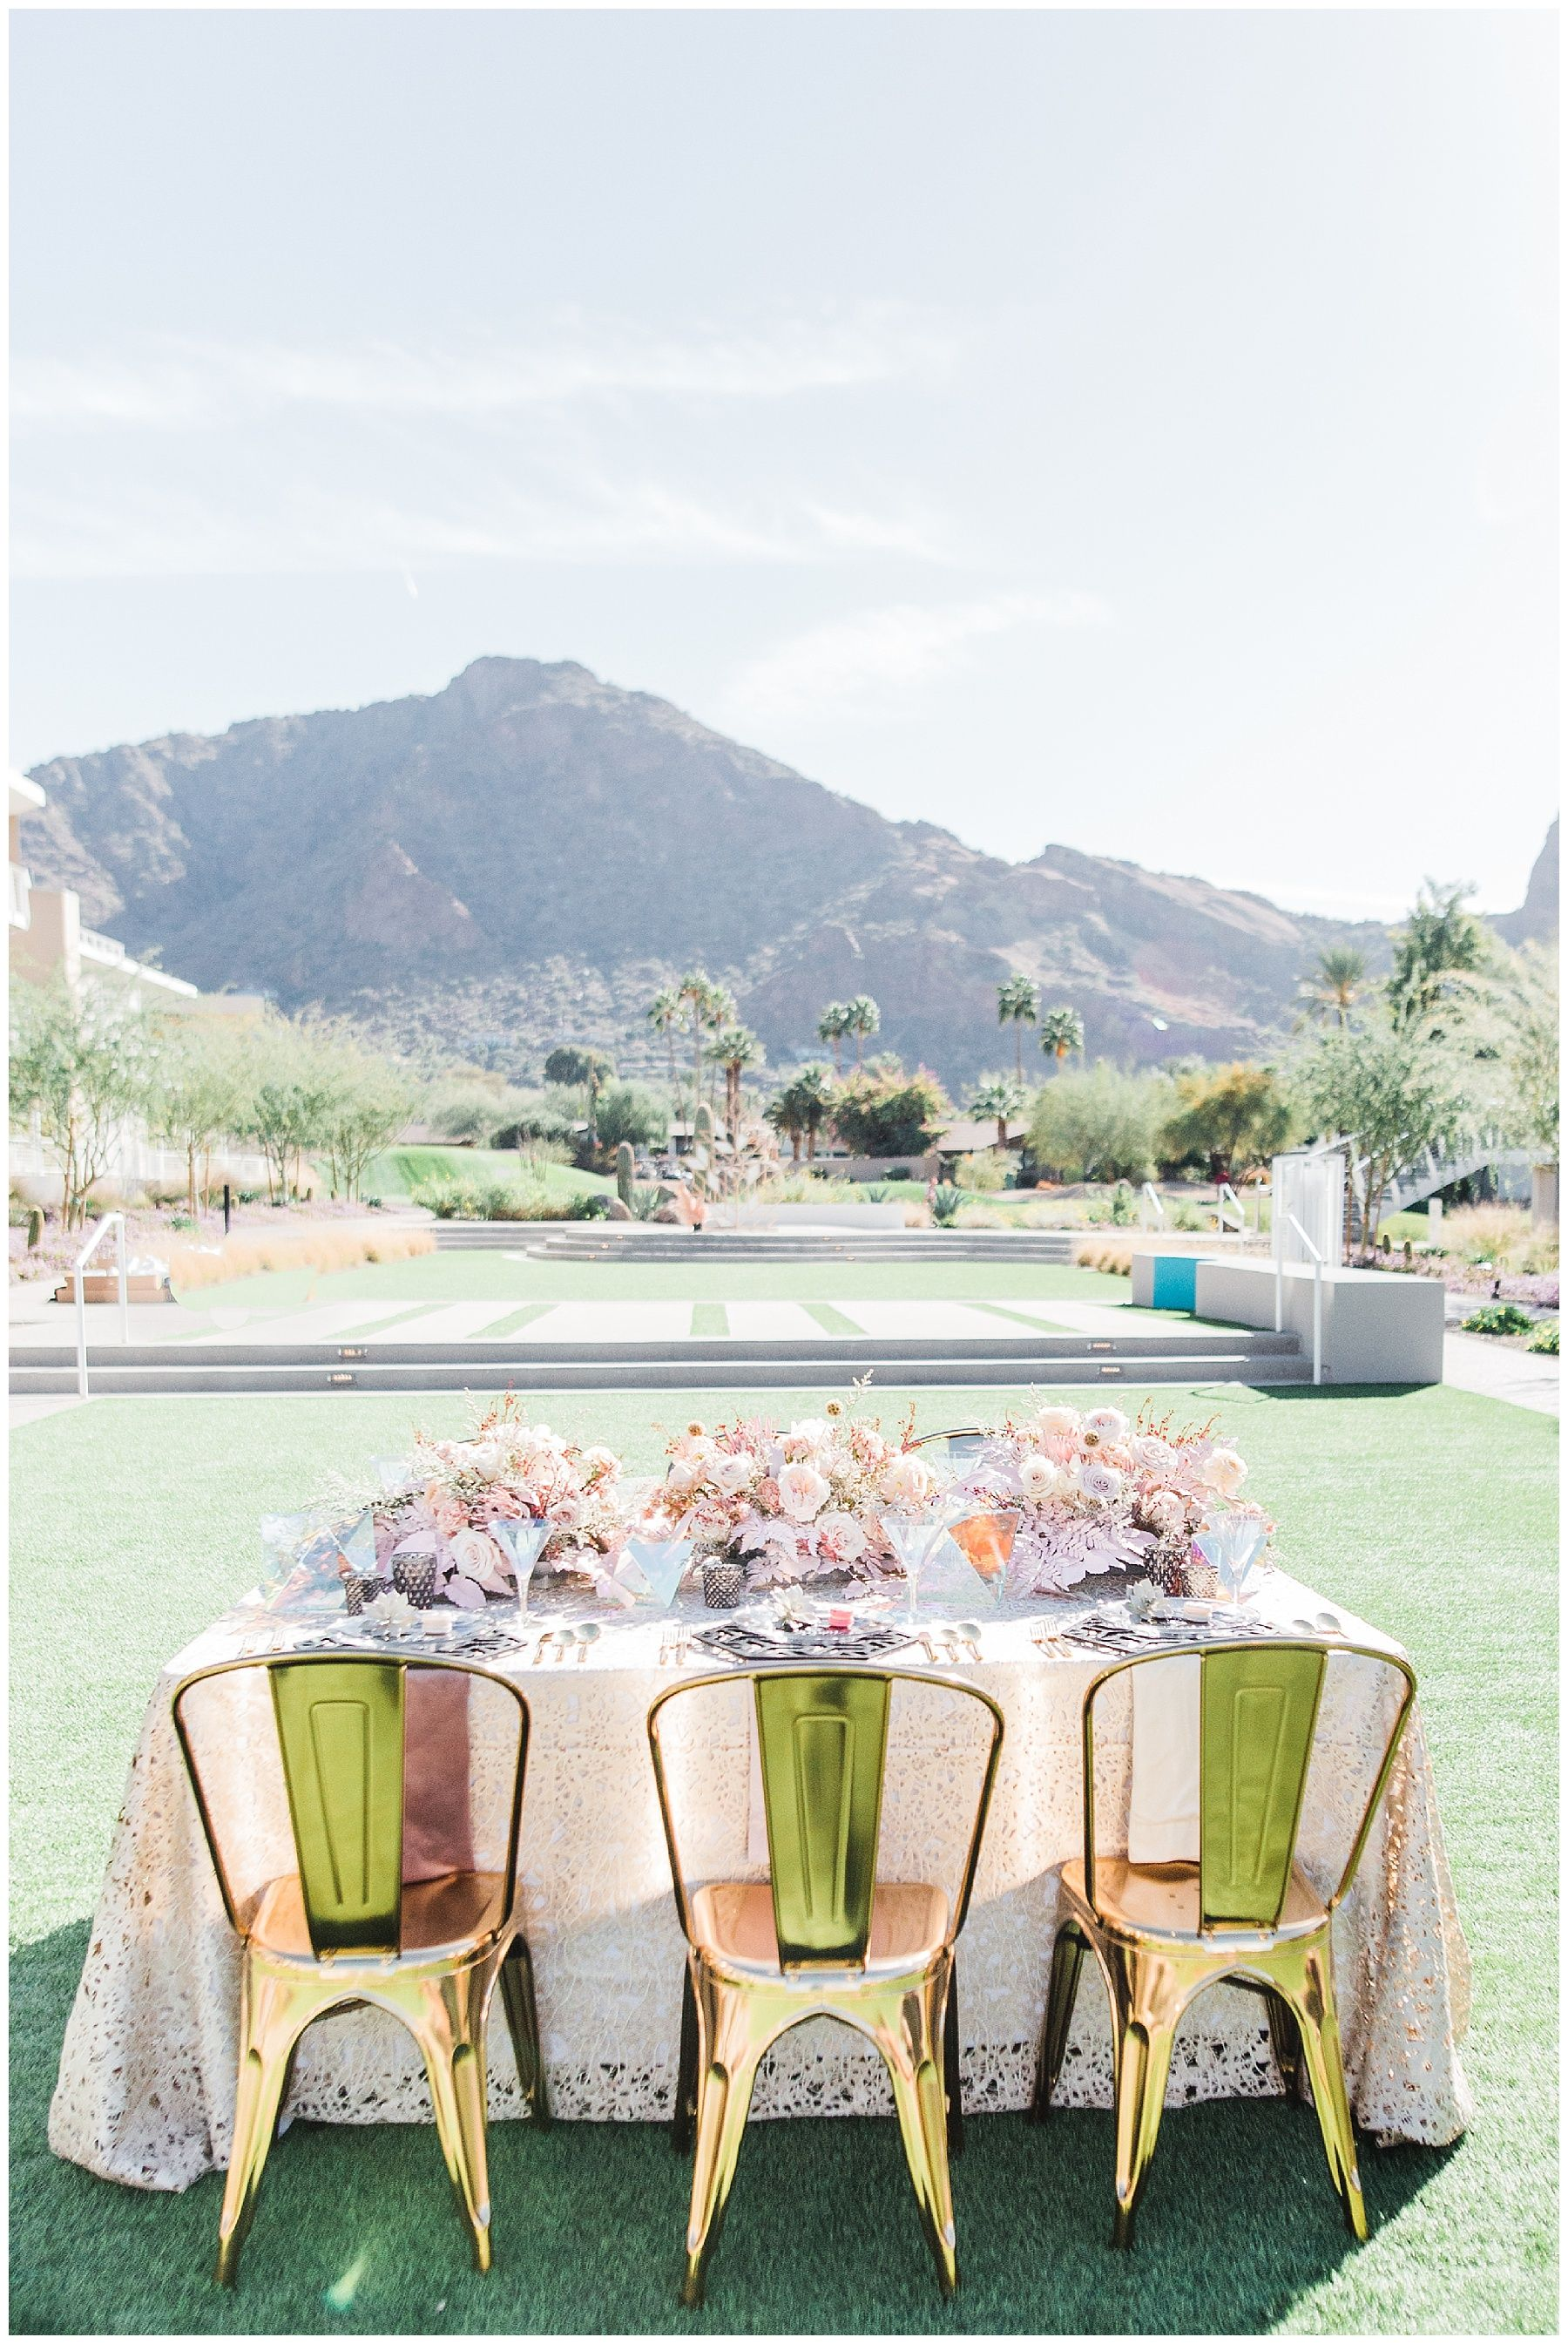 Rock and Roll Themed Arizona Wedding | Weddings That Inspire ...